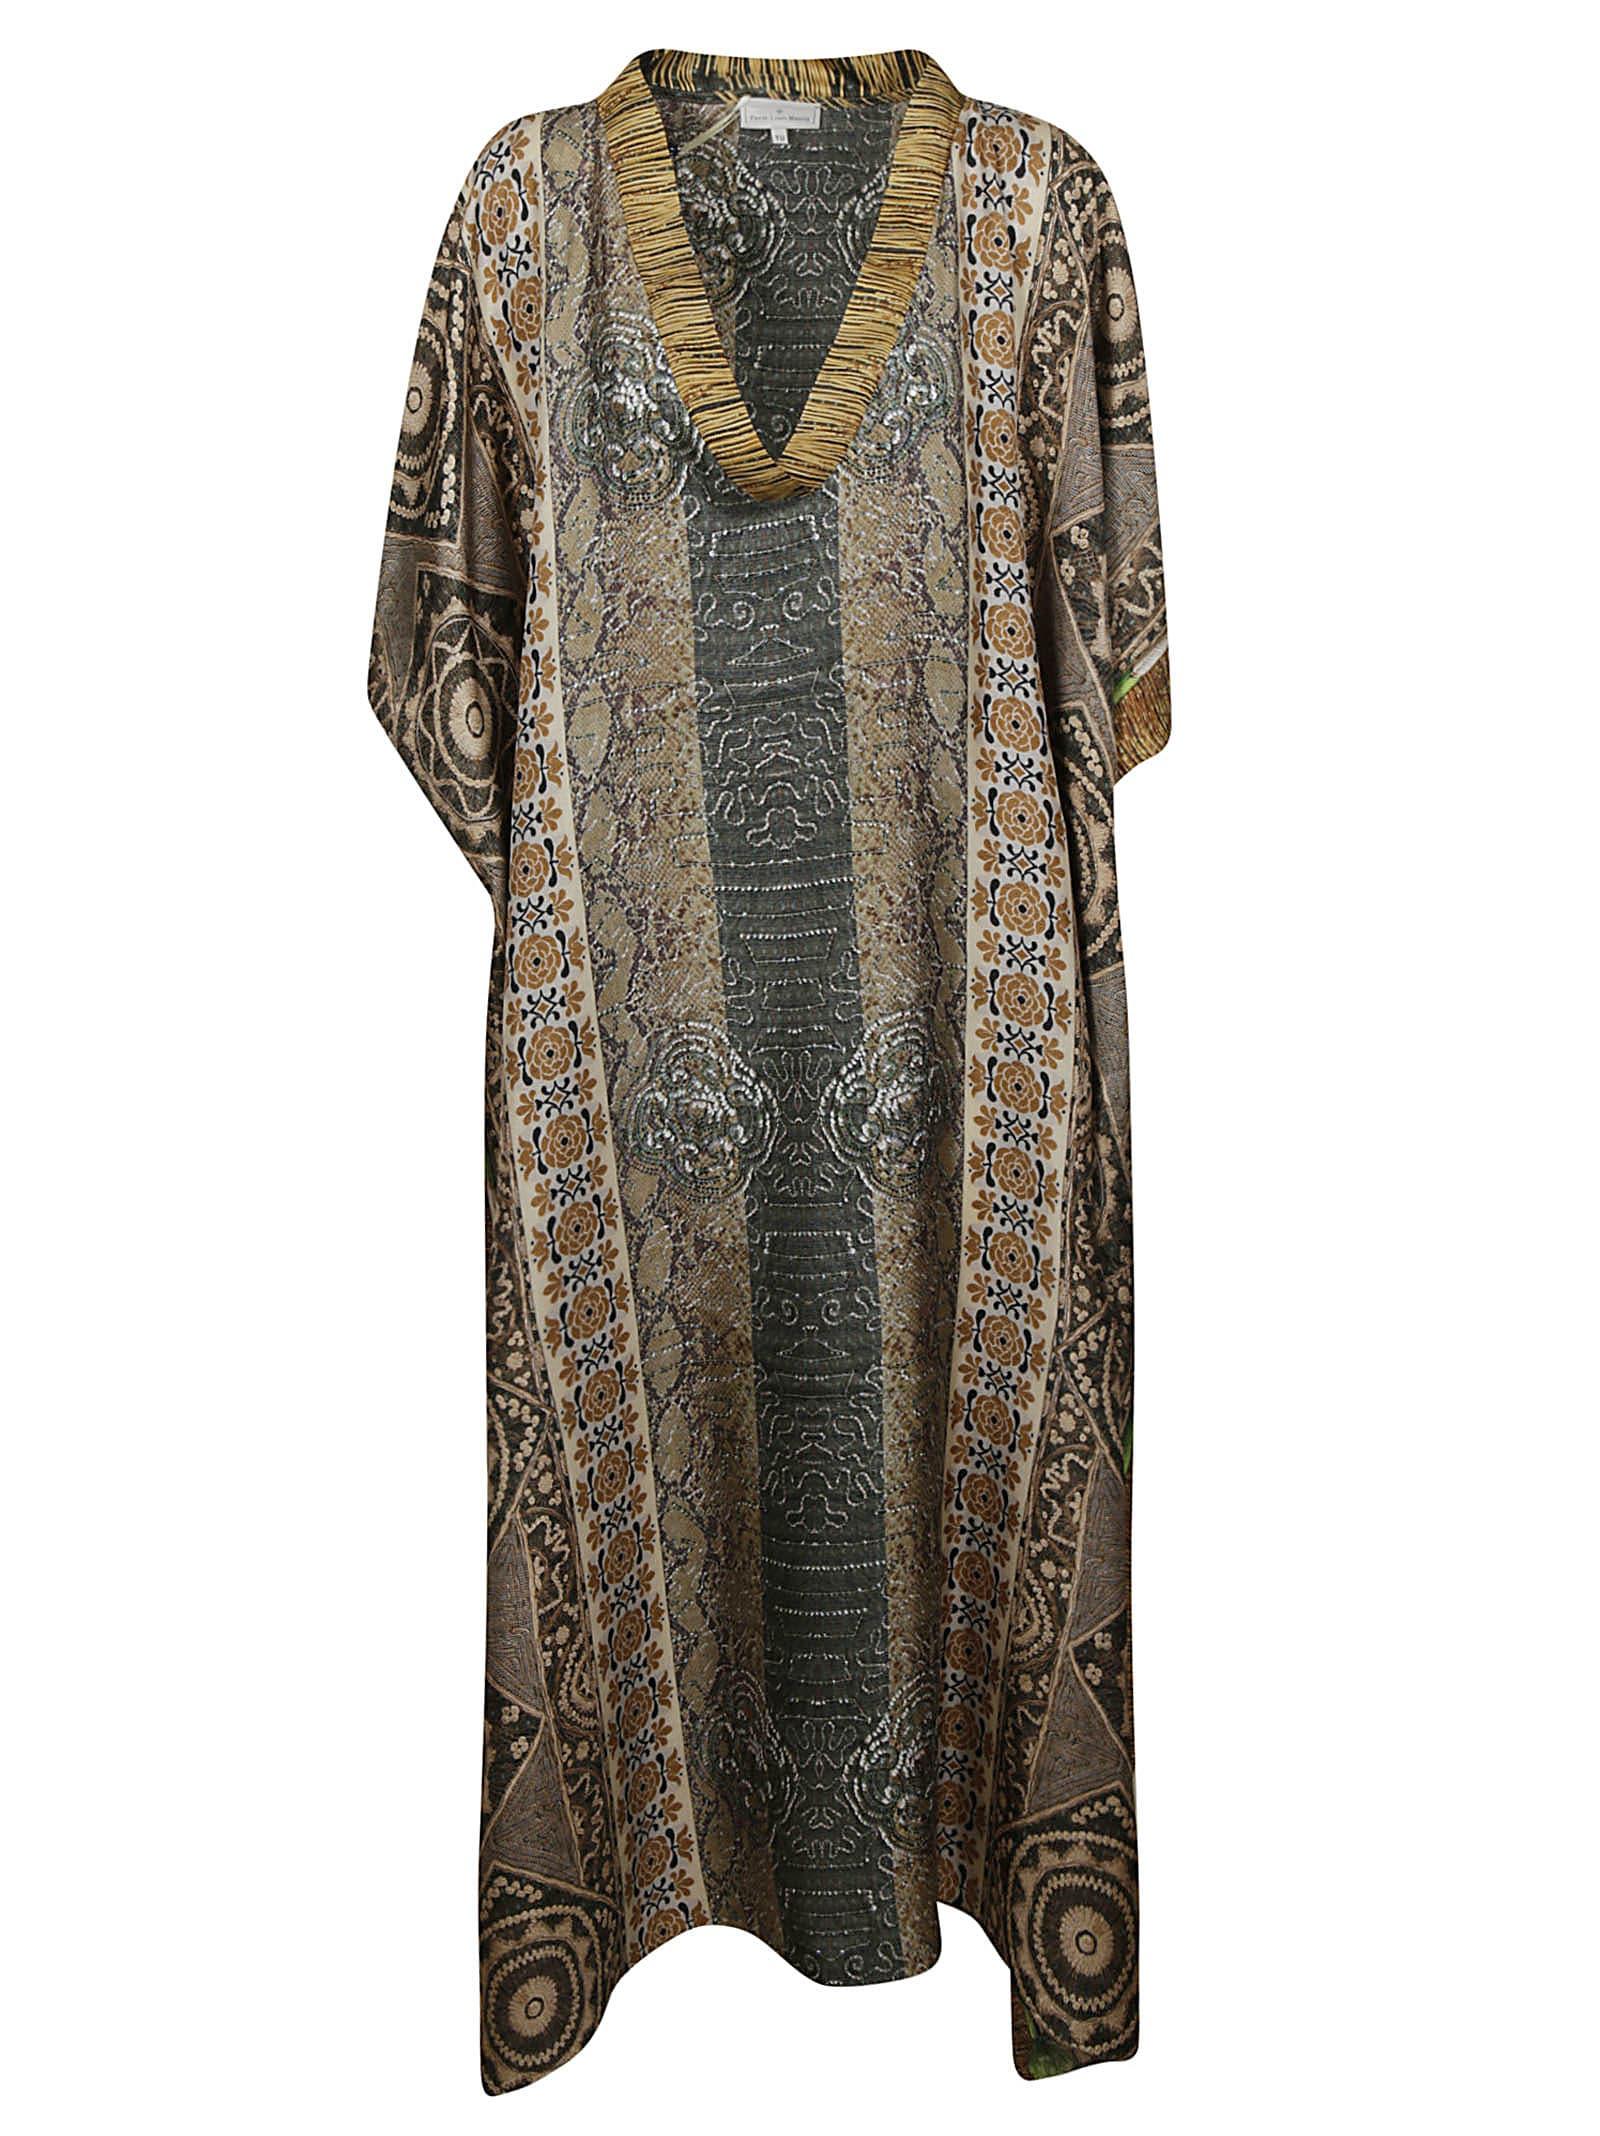 Buy Pierre-Louis Mascia V-neck Patterned Dress online, shop Pierre-Louis Mascia with free shipping